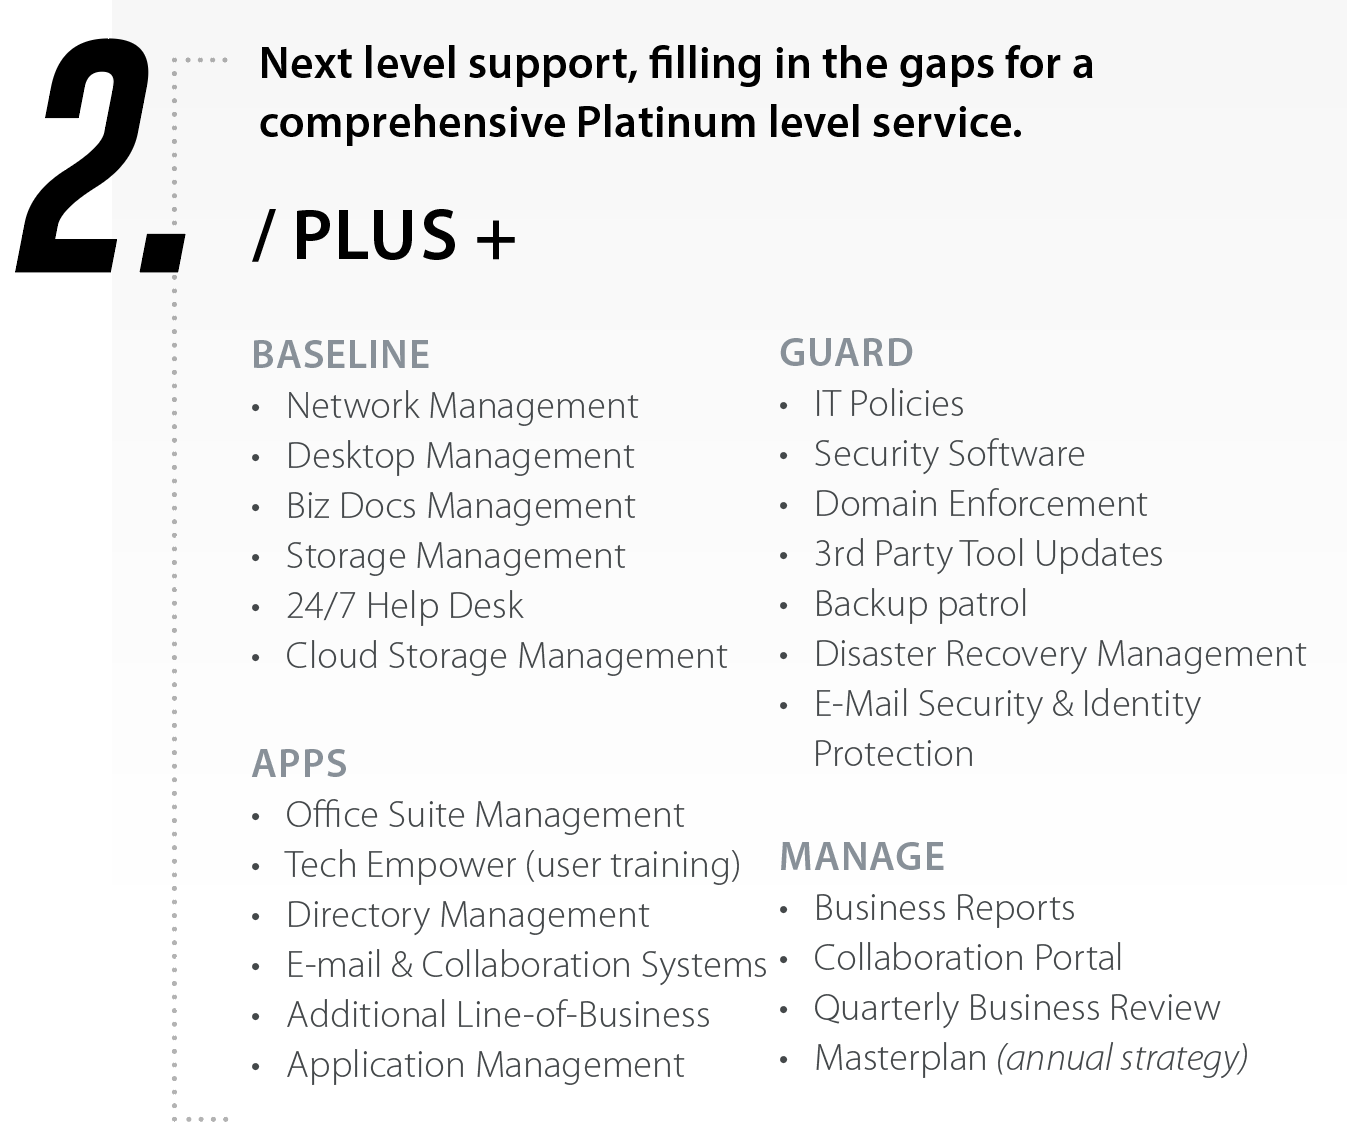 Core-2-JOT-Managed-Services